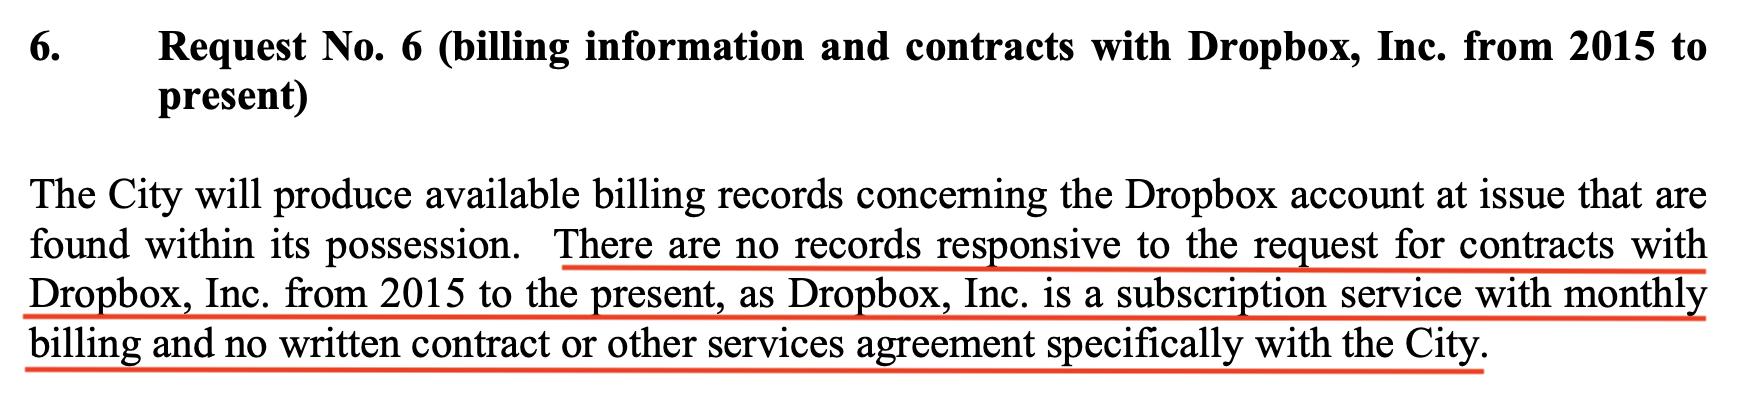 CPRA Fullerton Dropbox Response